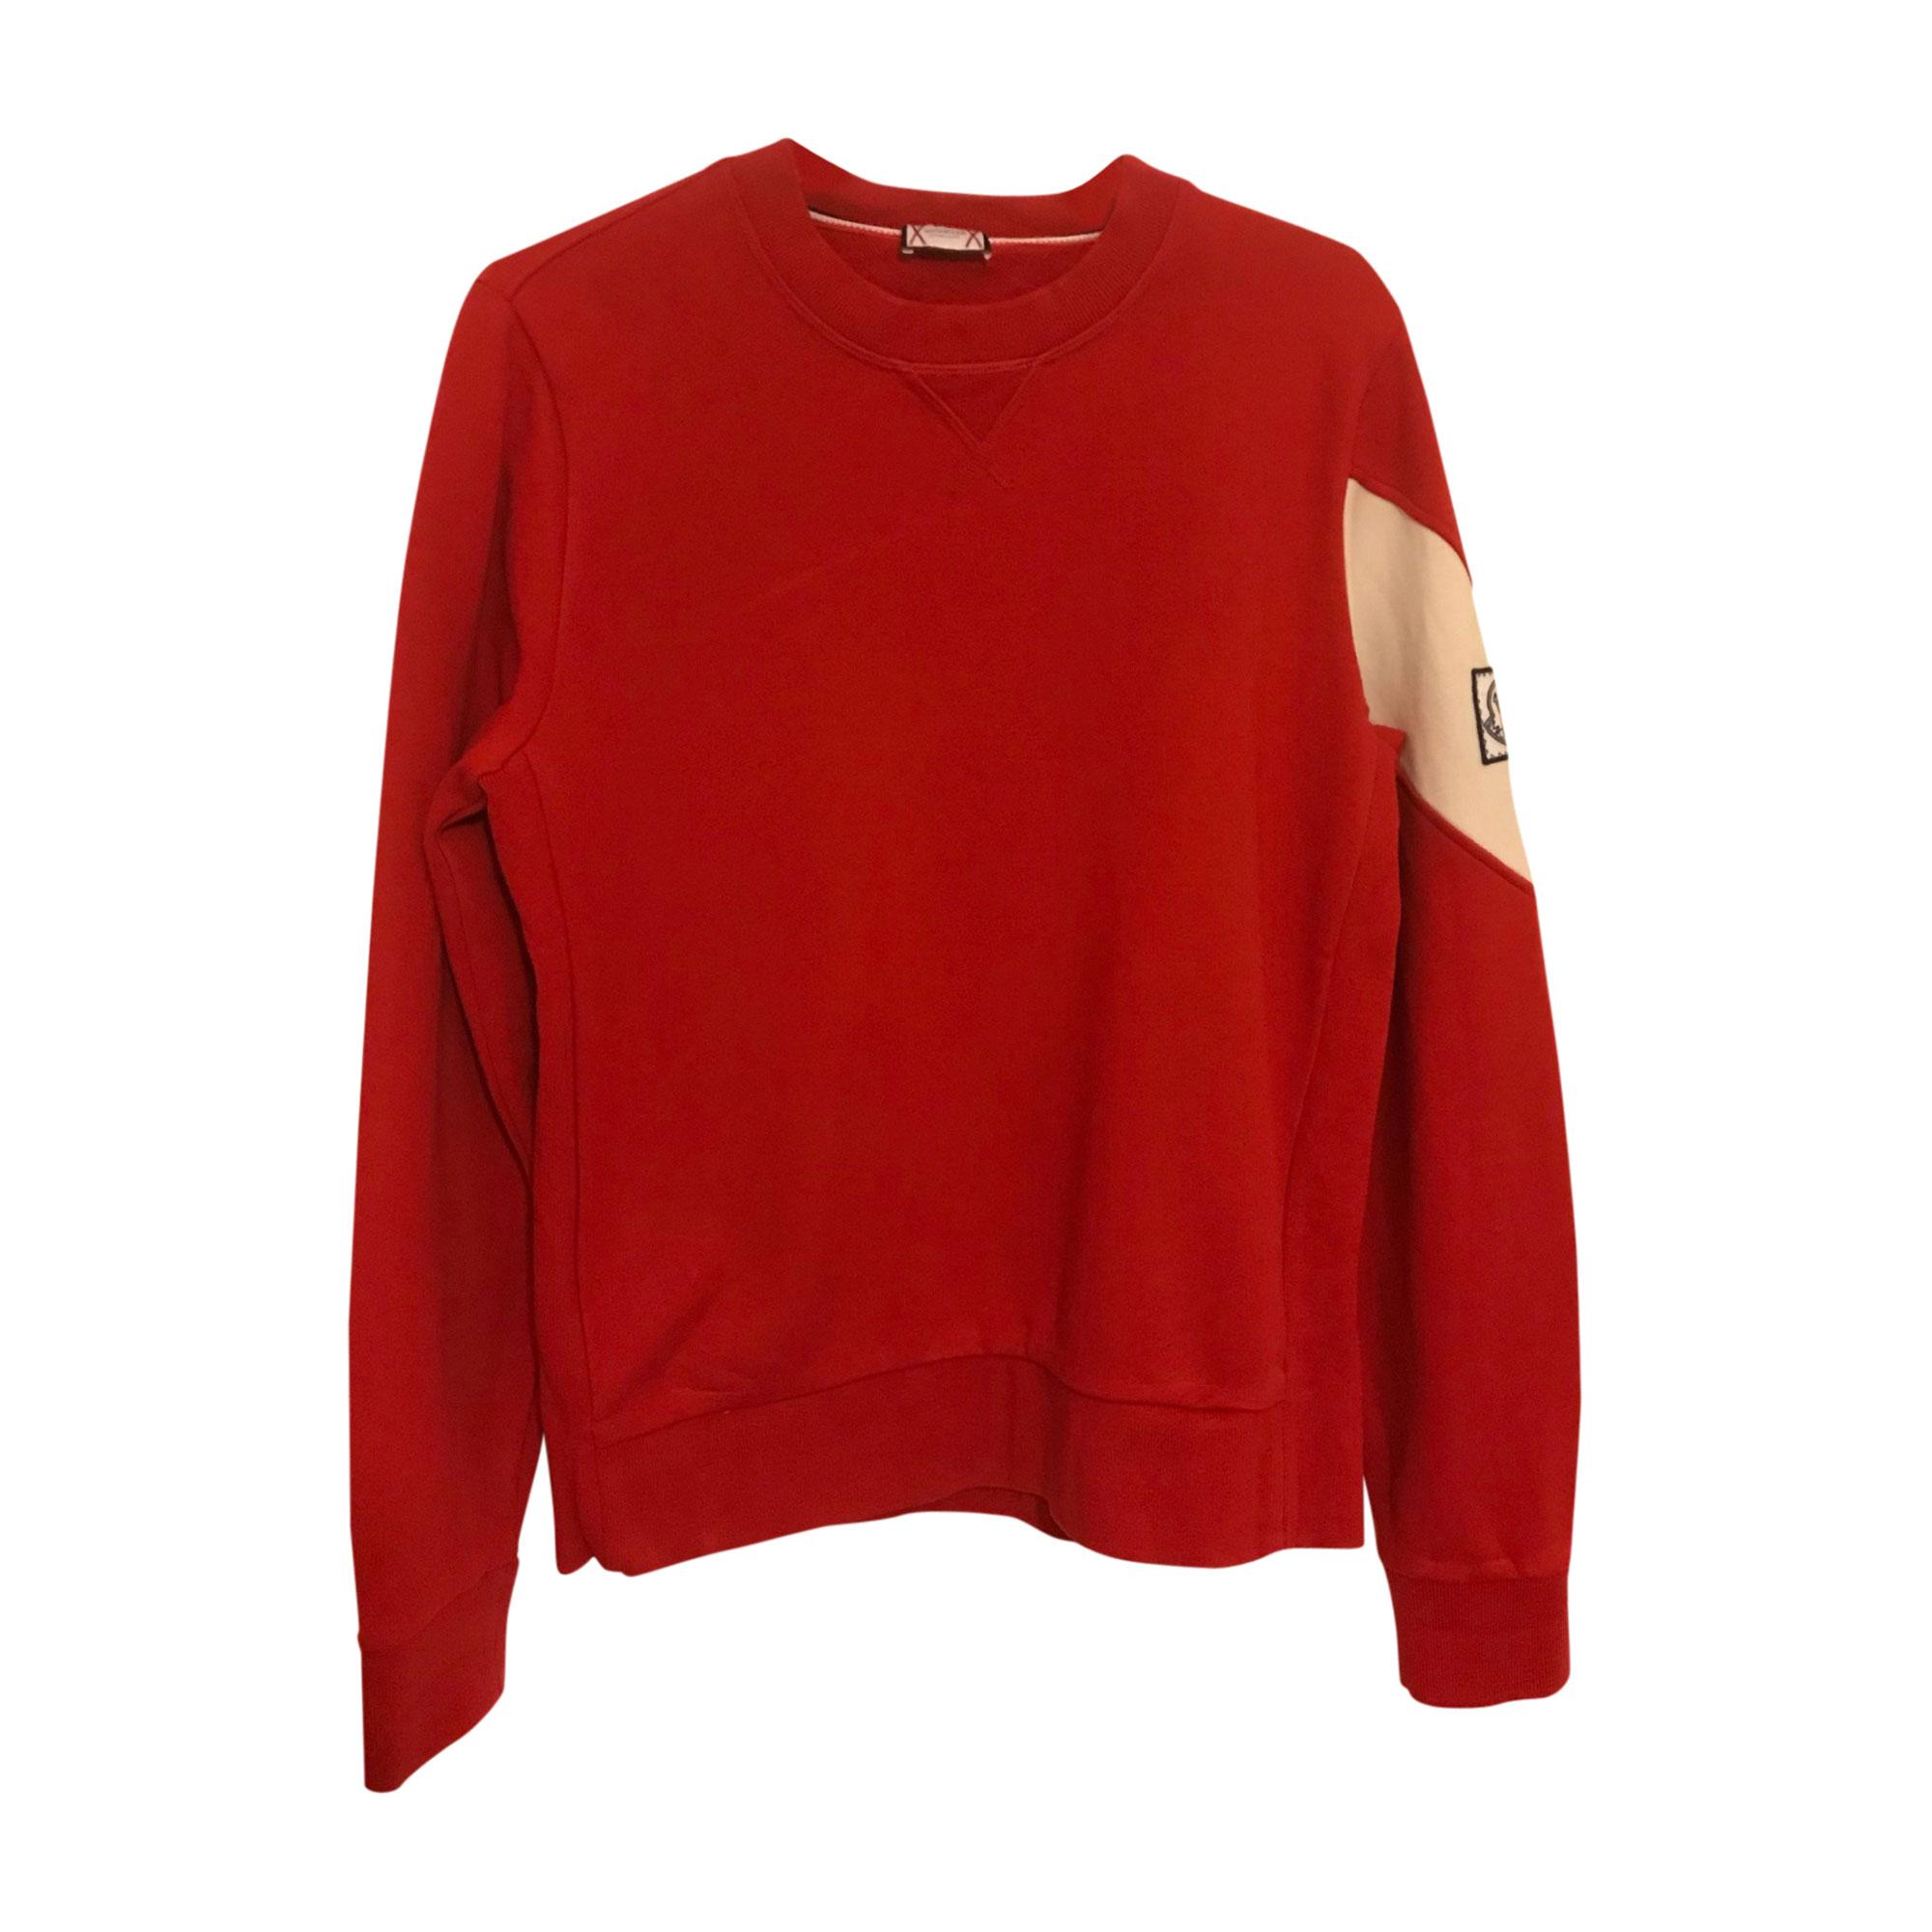 Sweatshirt MONCLER Red, burgundy